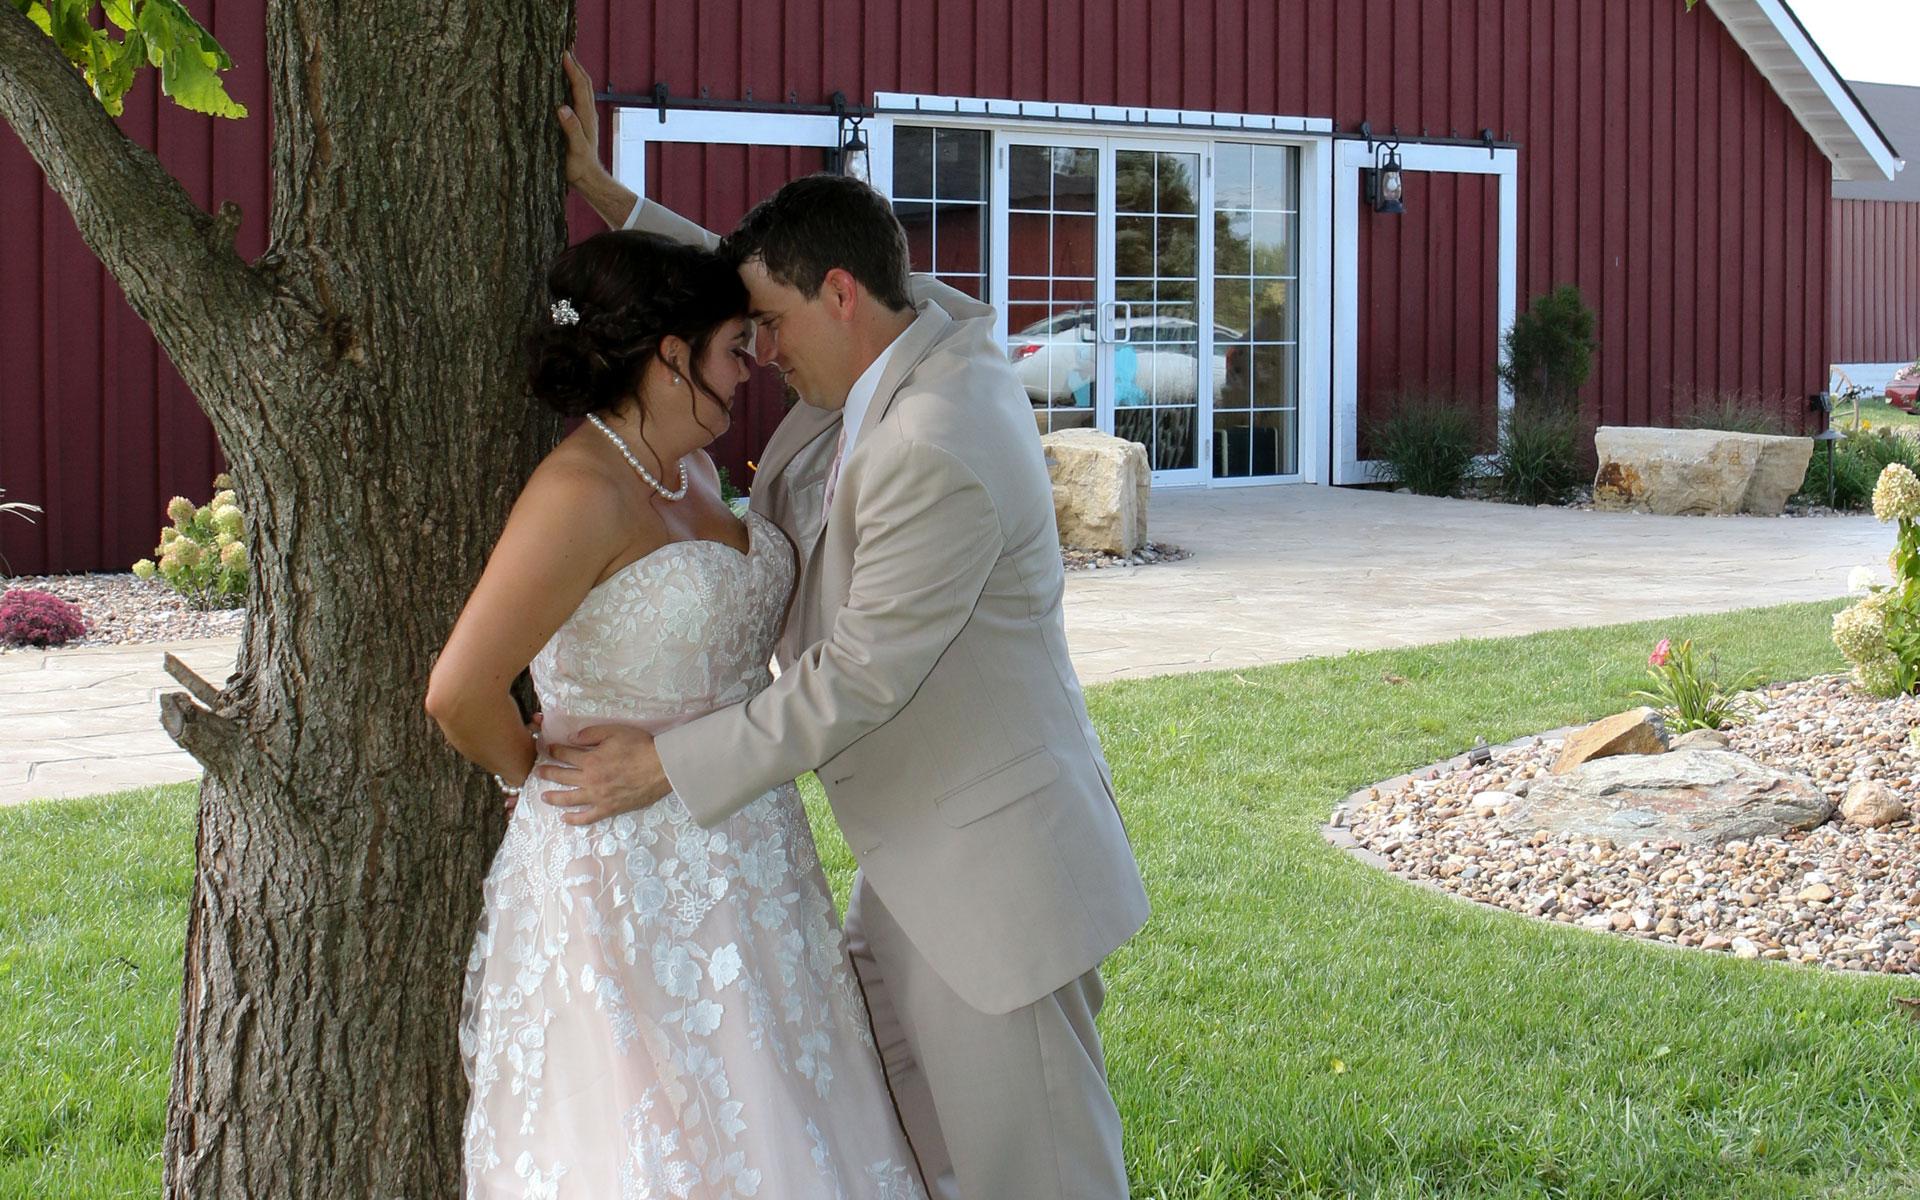 WeddingCouple-NearBarn.jpg